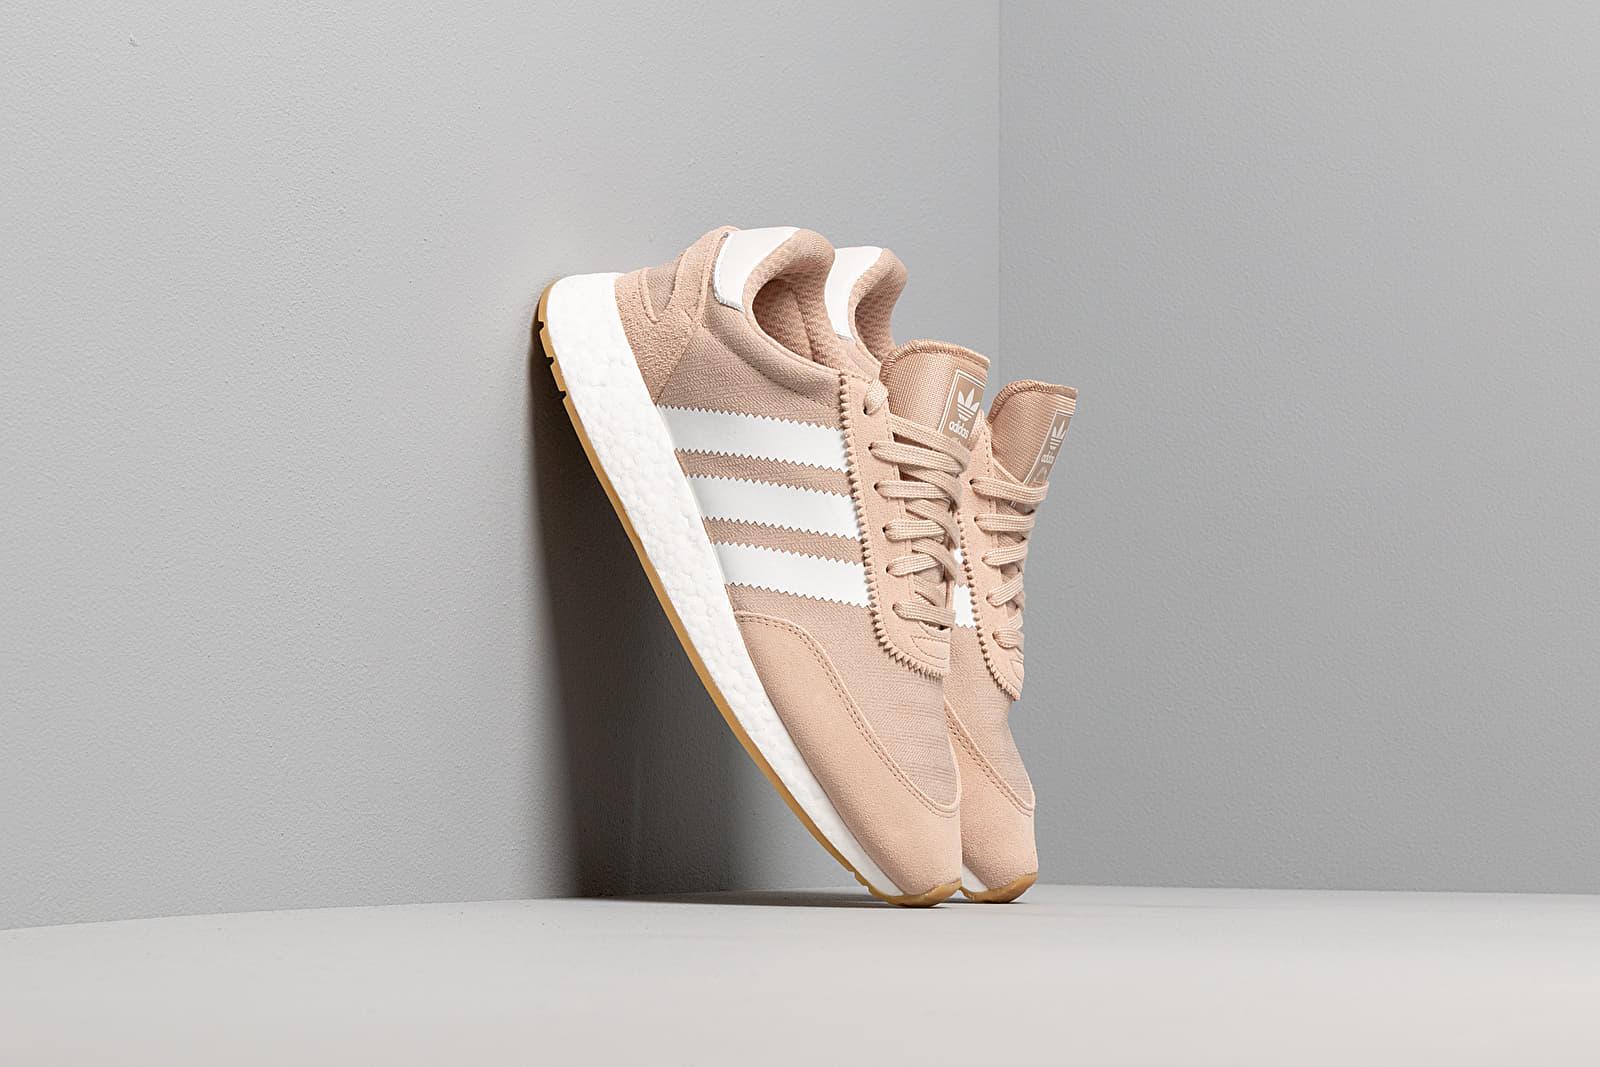 Moški čevlji adidas I-5923 St Pale Nude/ Crystal White/ Ftw White